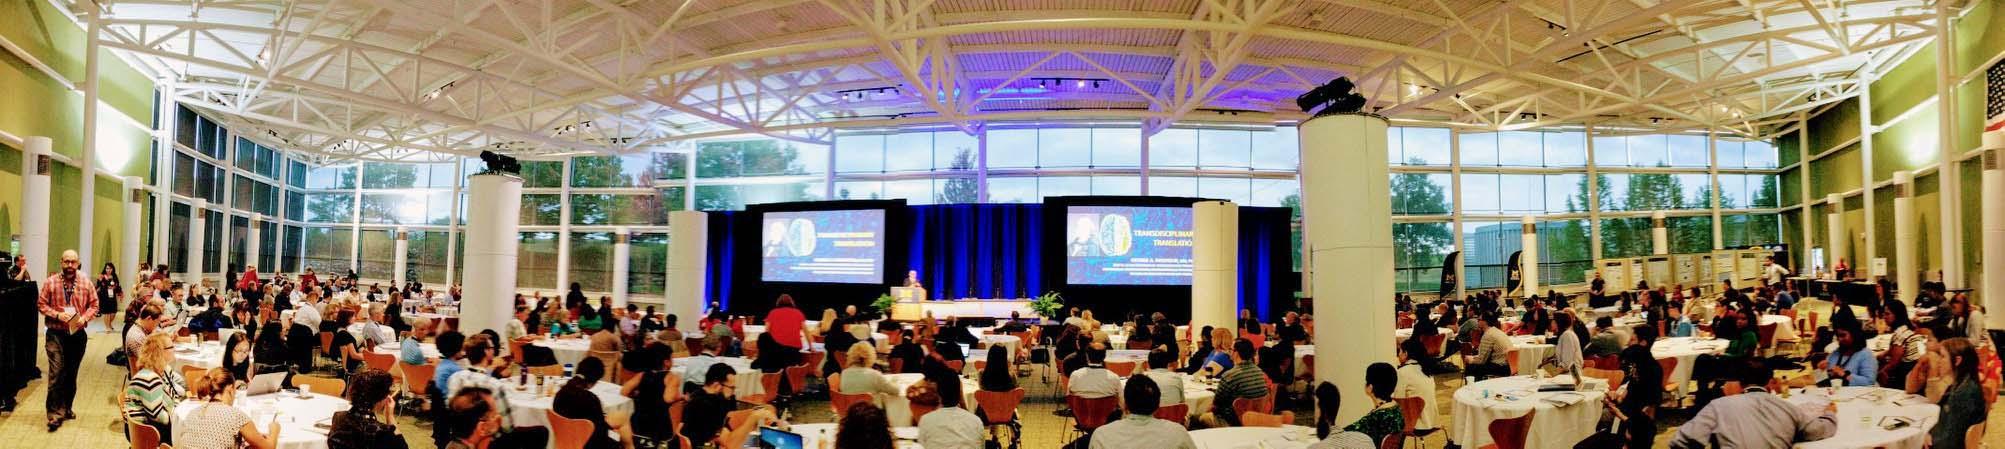 Symposium panorama pic.jpg